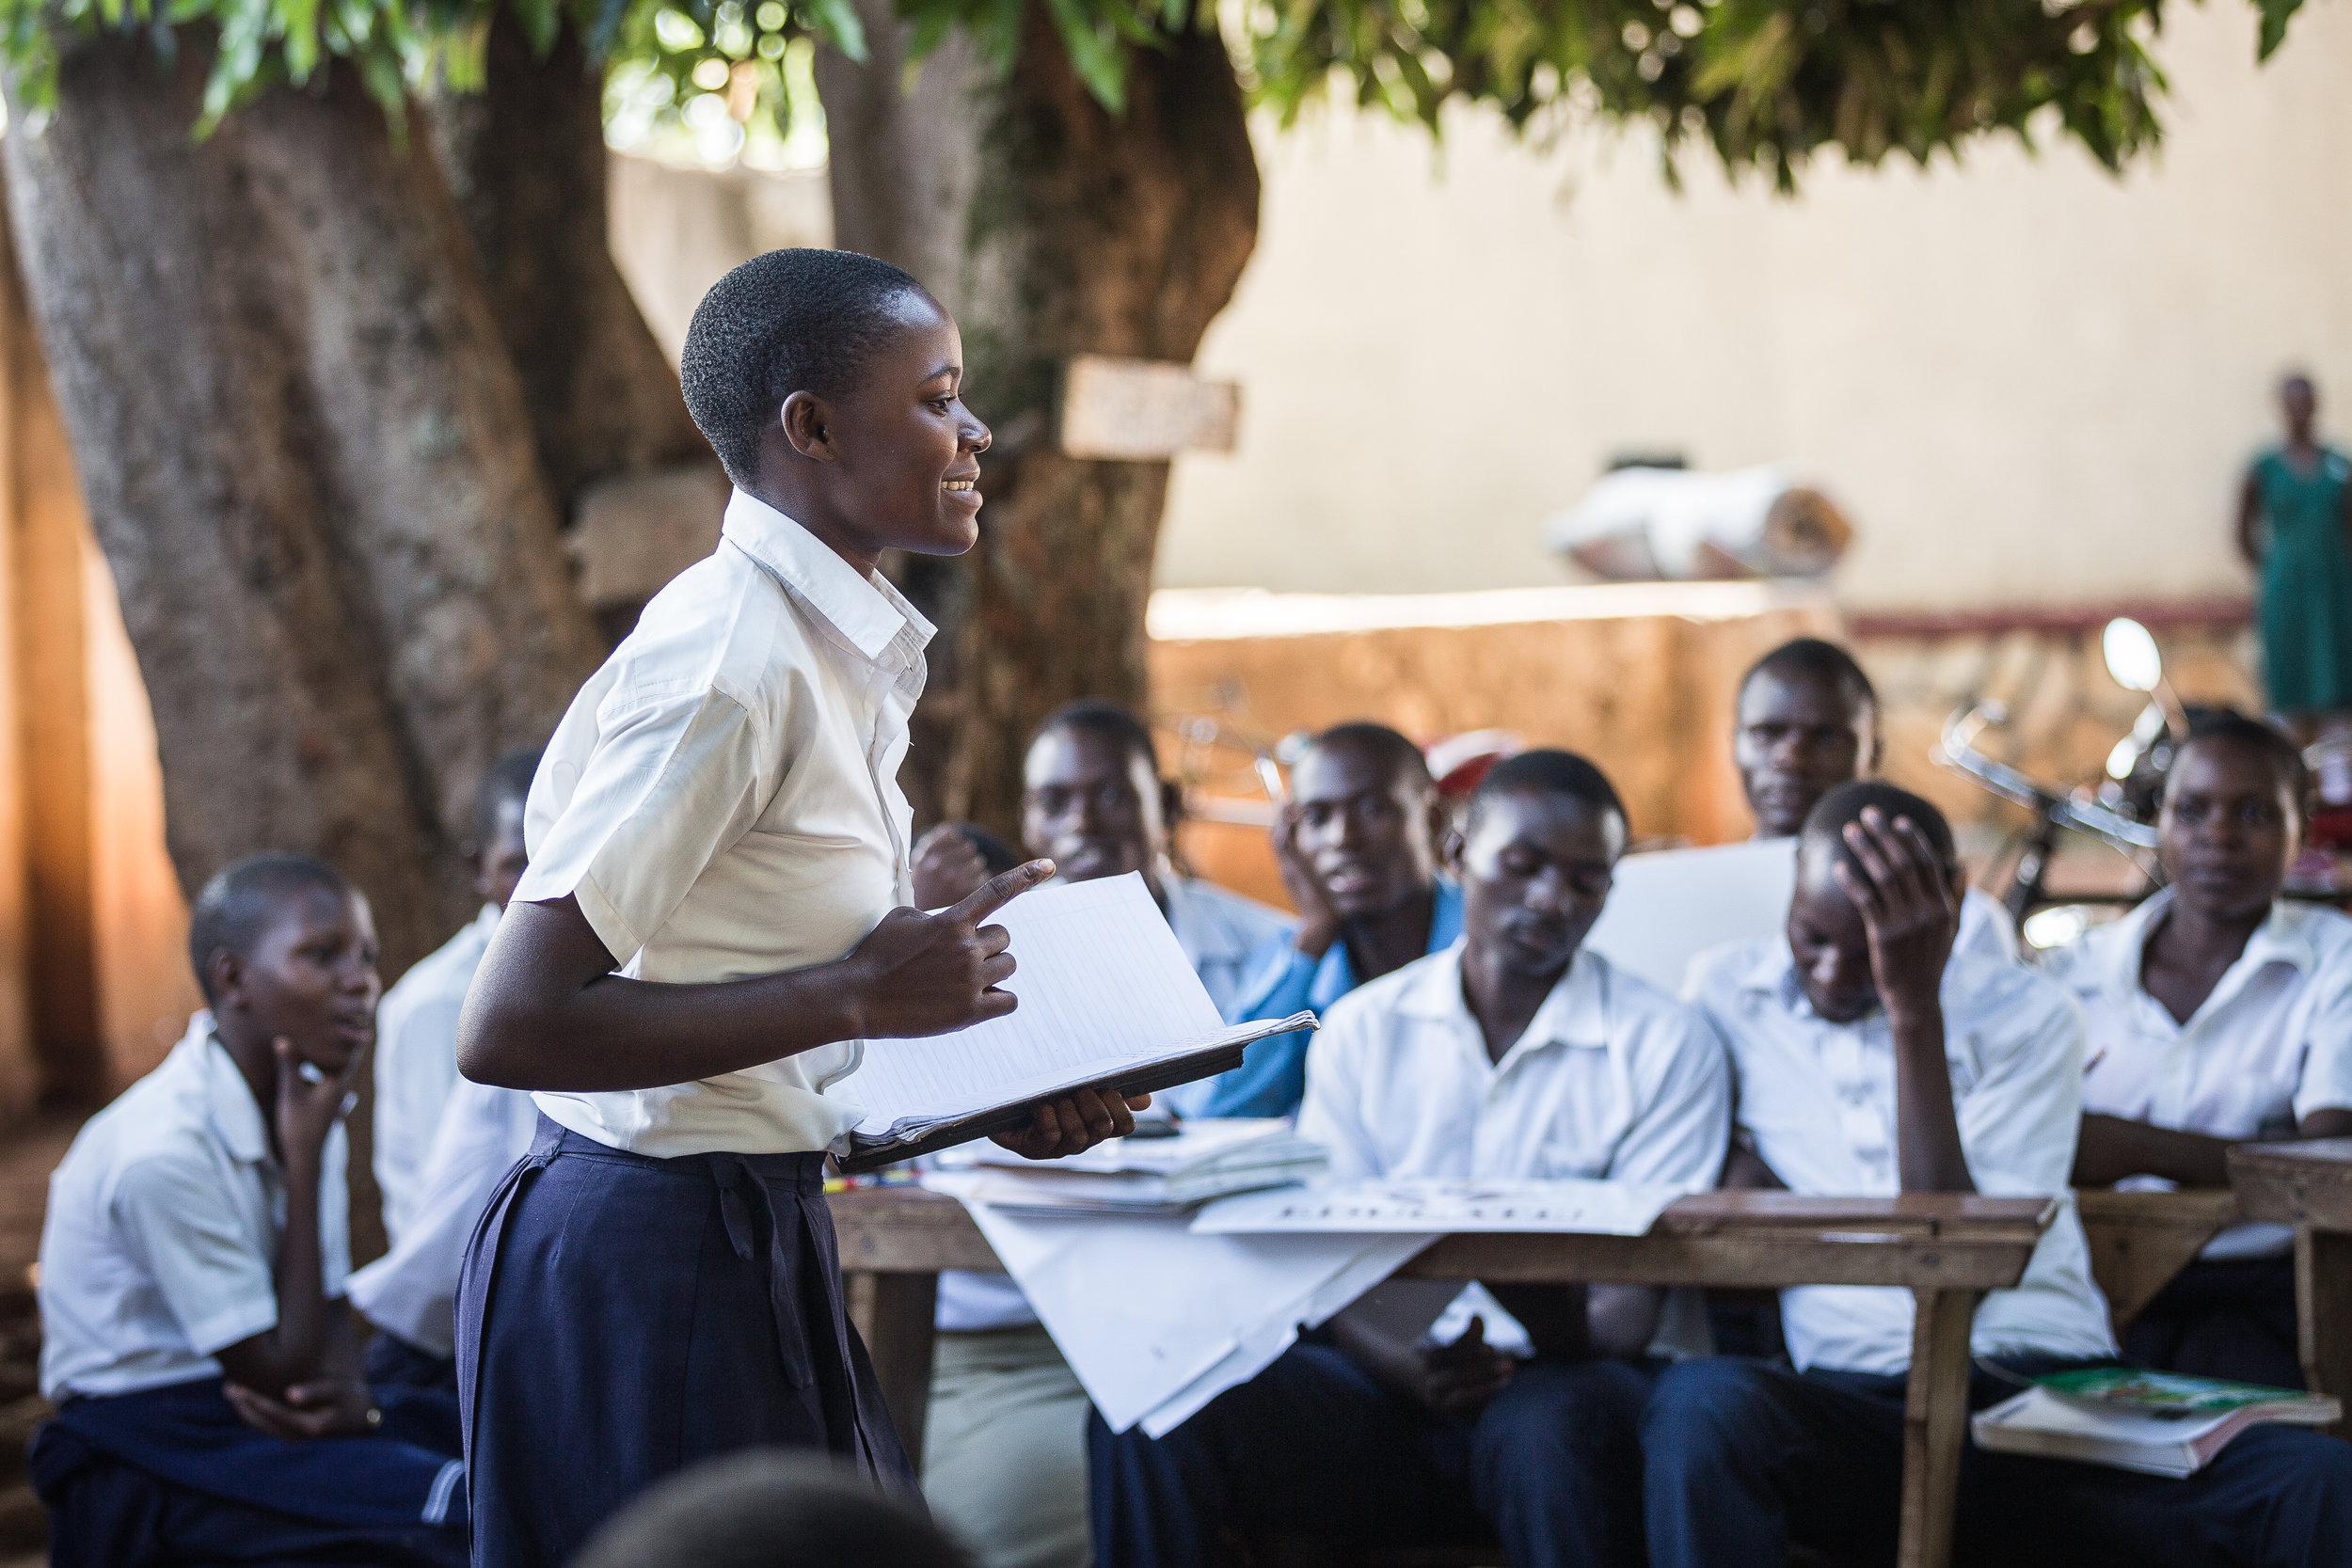 Direct Implementation: - In-School Programs